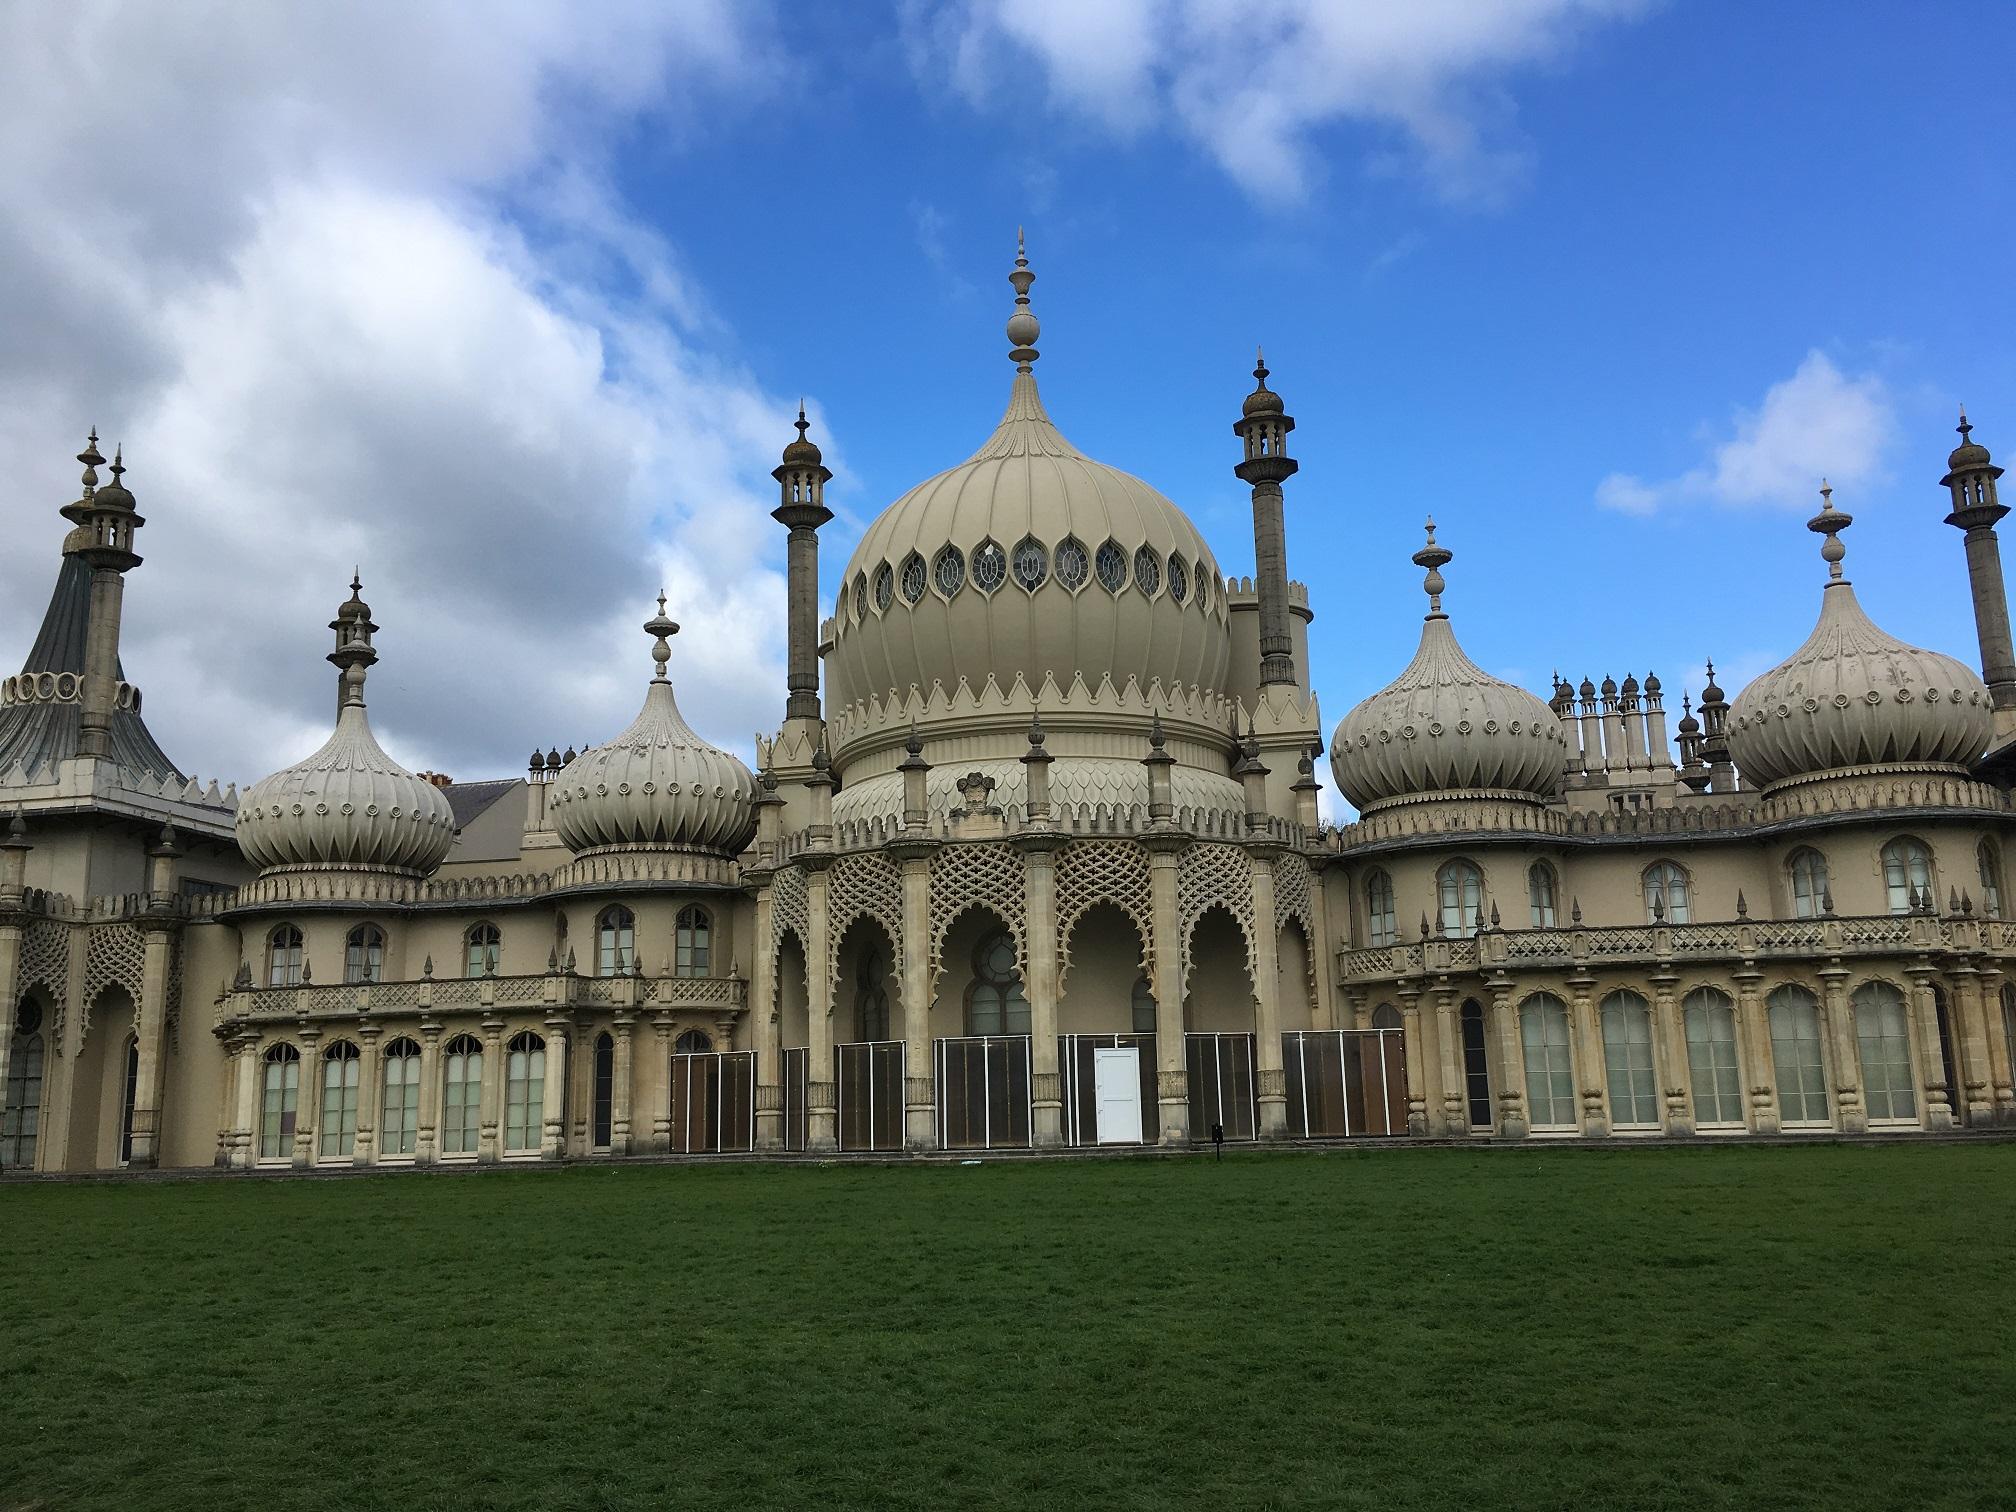 Royal Pavilion (2)